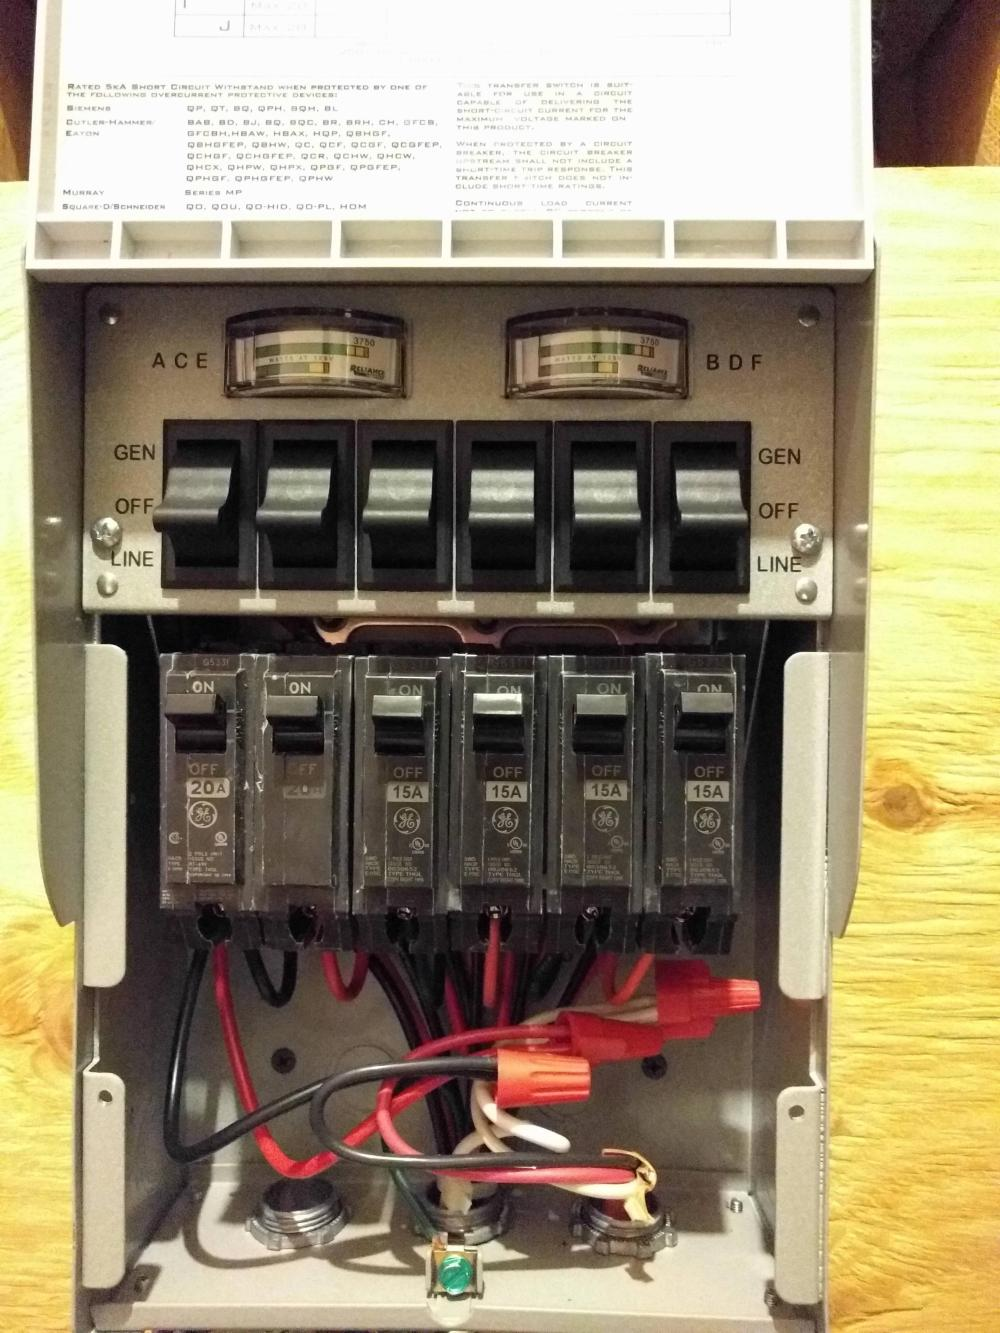 medium resolution of wiring a reliance transfer switch wiring diagram expert wiring diagram for reliance transfer switch generator troubleshoot